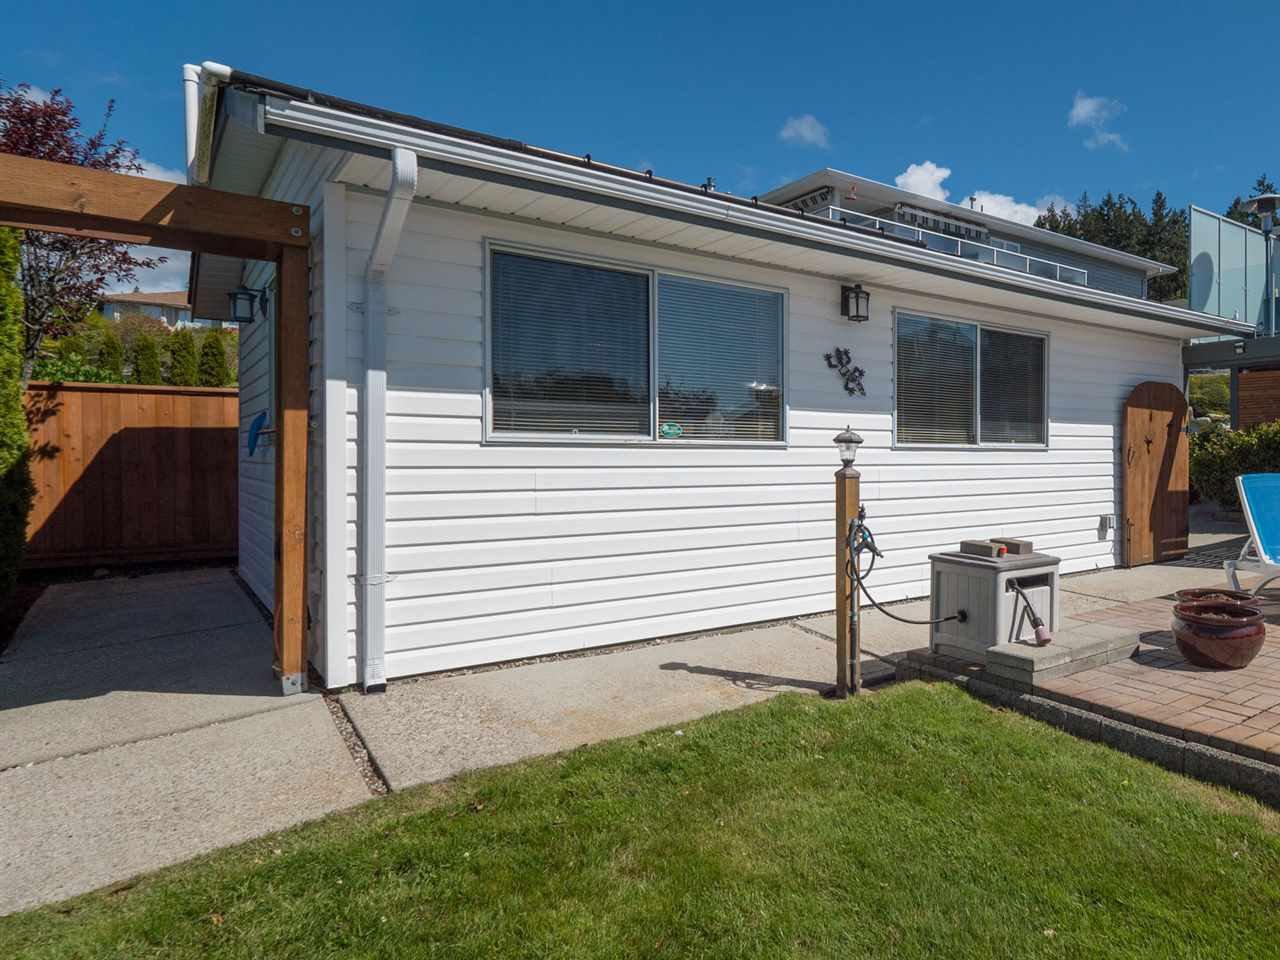 Photo 19: Photos: 4983 ARBUTUS Road in Sechelt: Sechelt District House for sale (Sunshine Coast)  : MLS®# R2427502